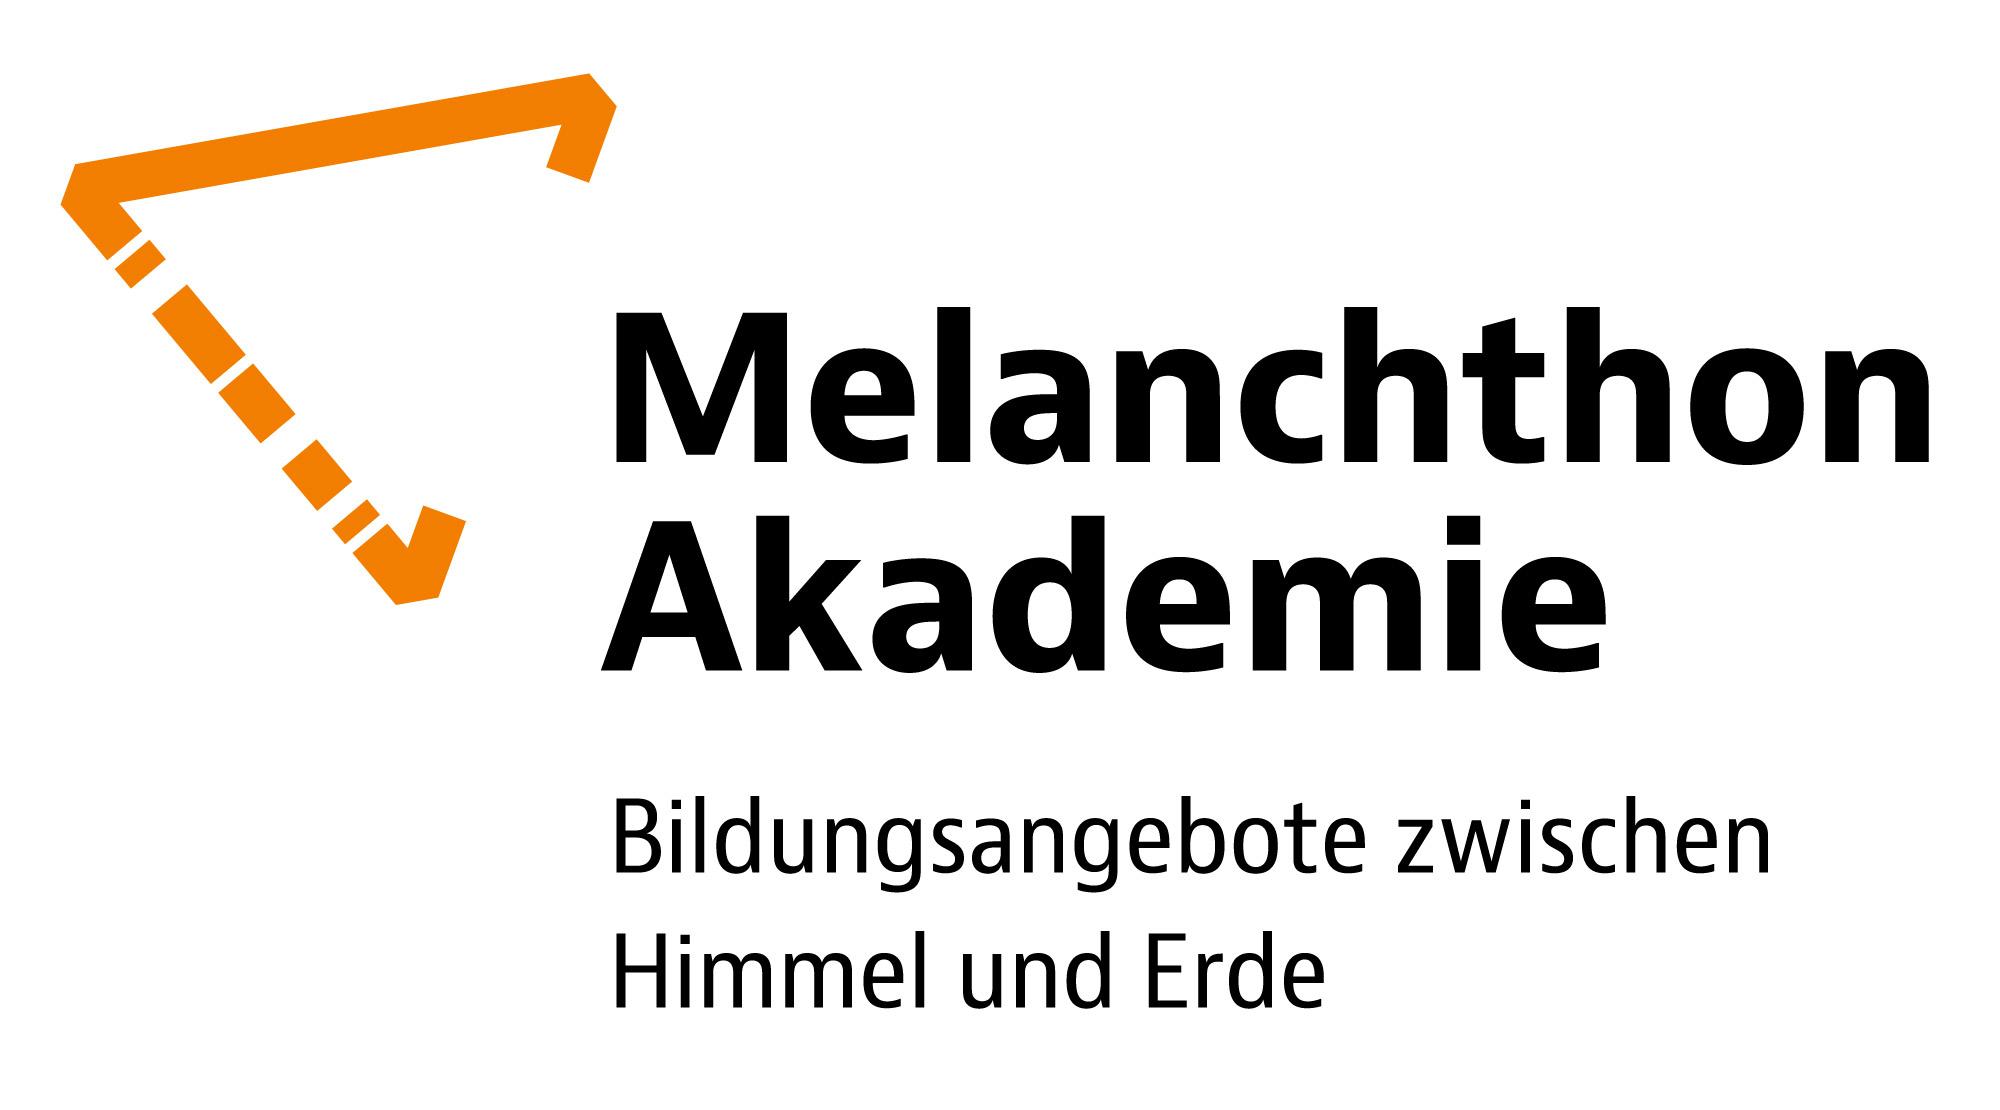 Melanchthon-Akademie_Logo-Claim_RGB_2000px